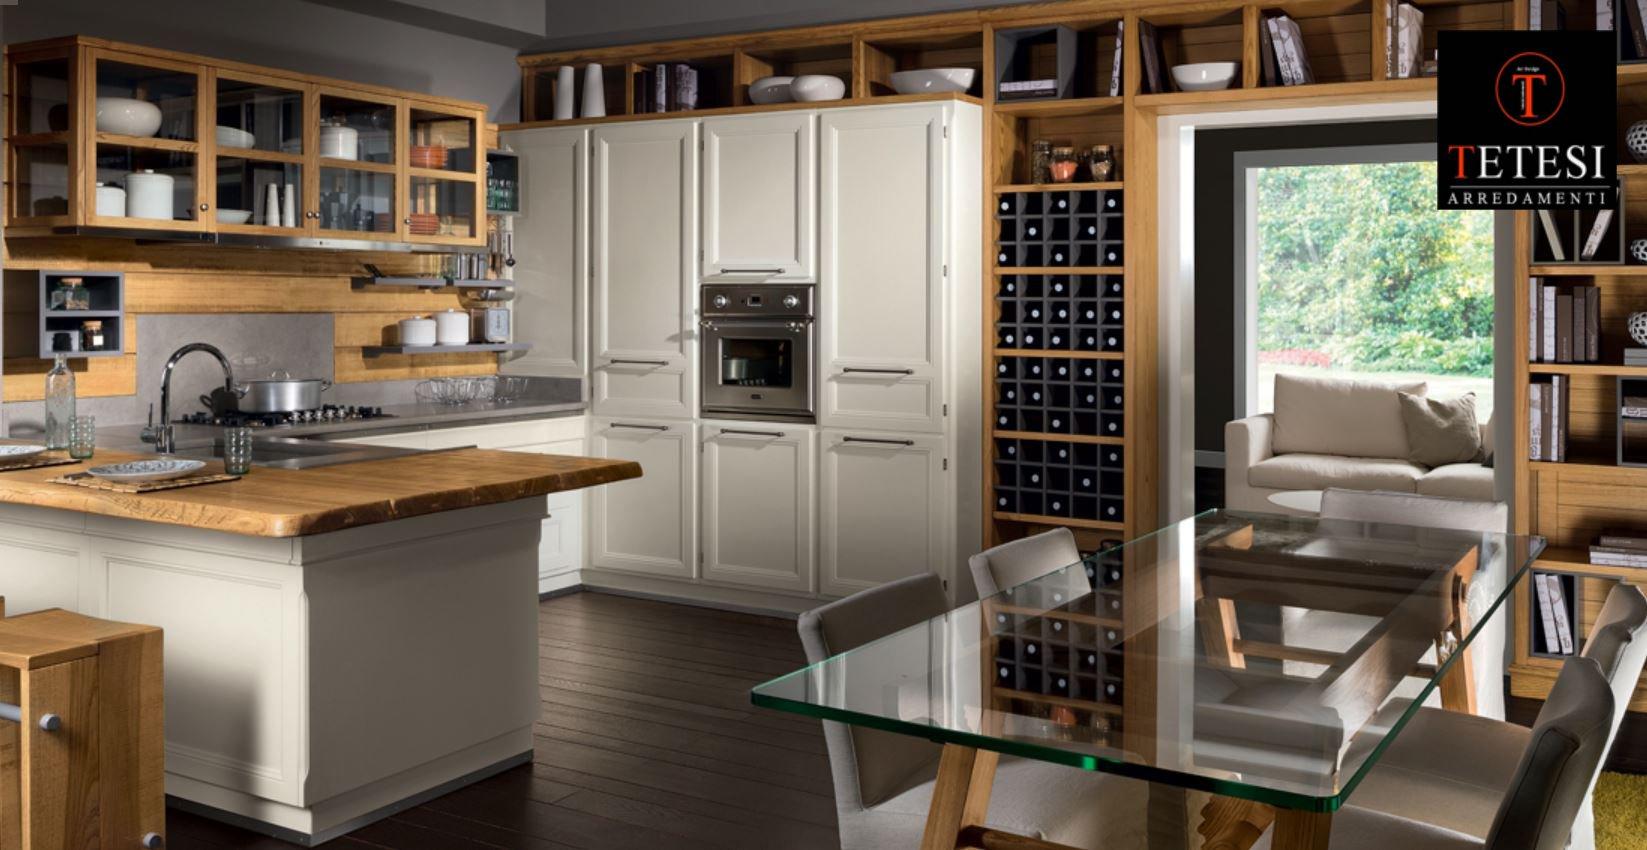 Tetesi arredamenti art design centro cucine l 39 ottocento - Cucine stile francese ...